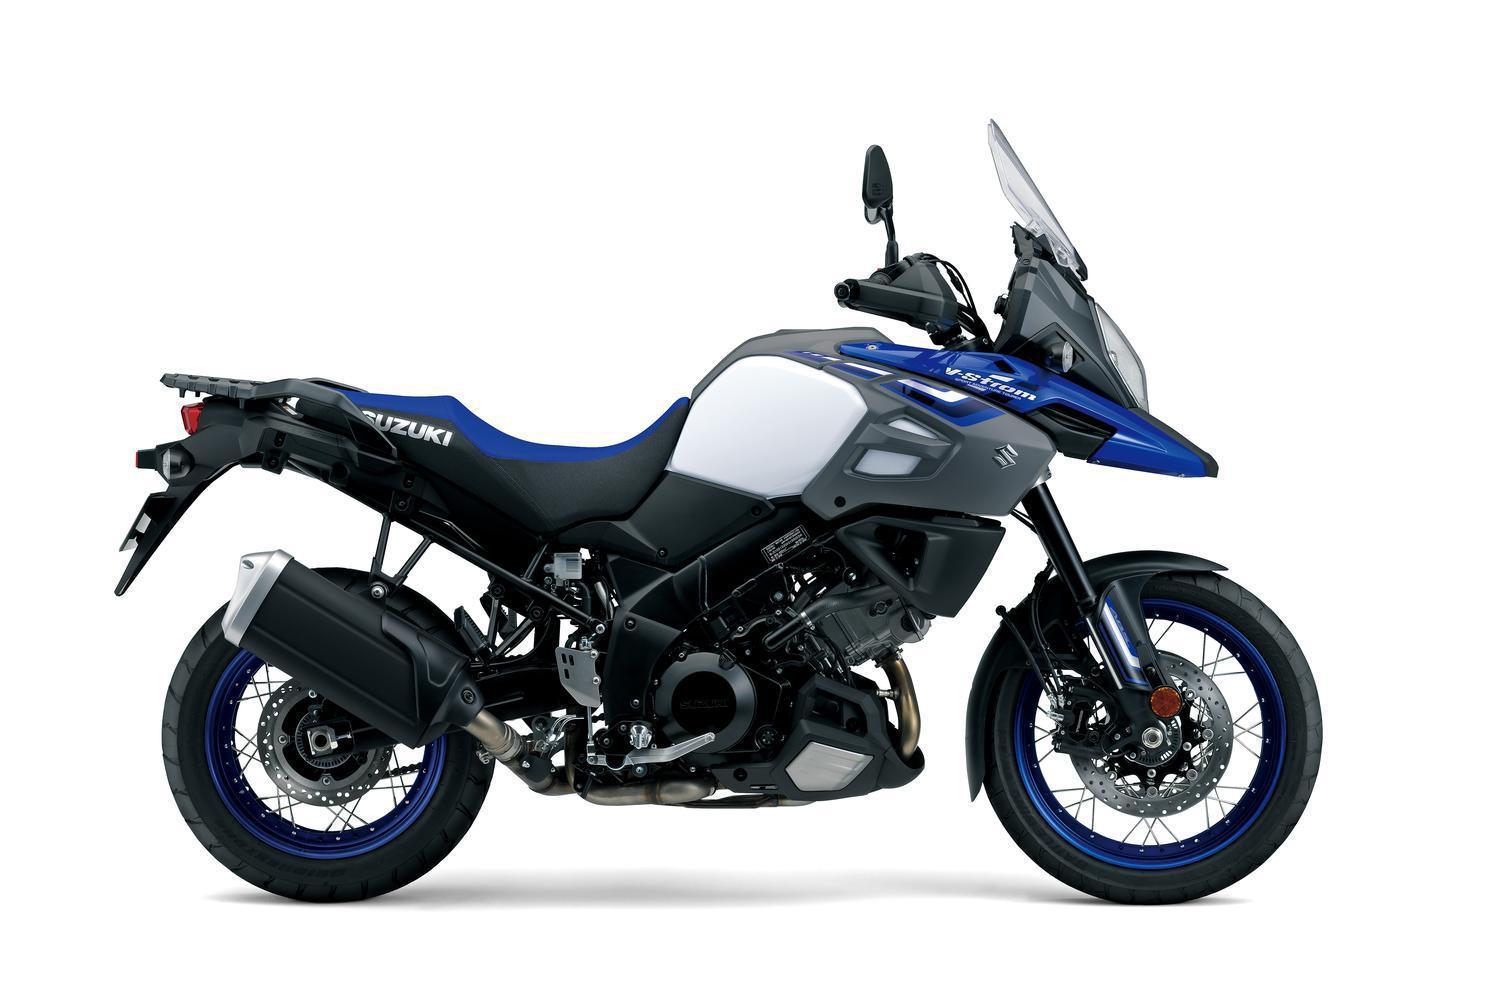 2019 Suzuki V-STROM 1000X ABS. Frais inclus+Taxes